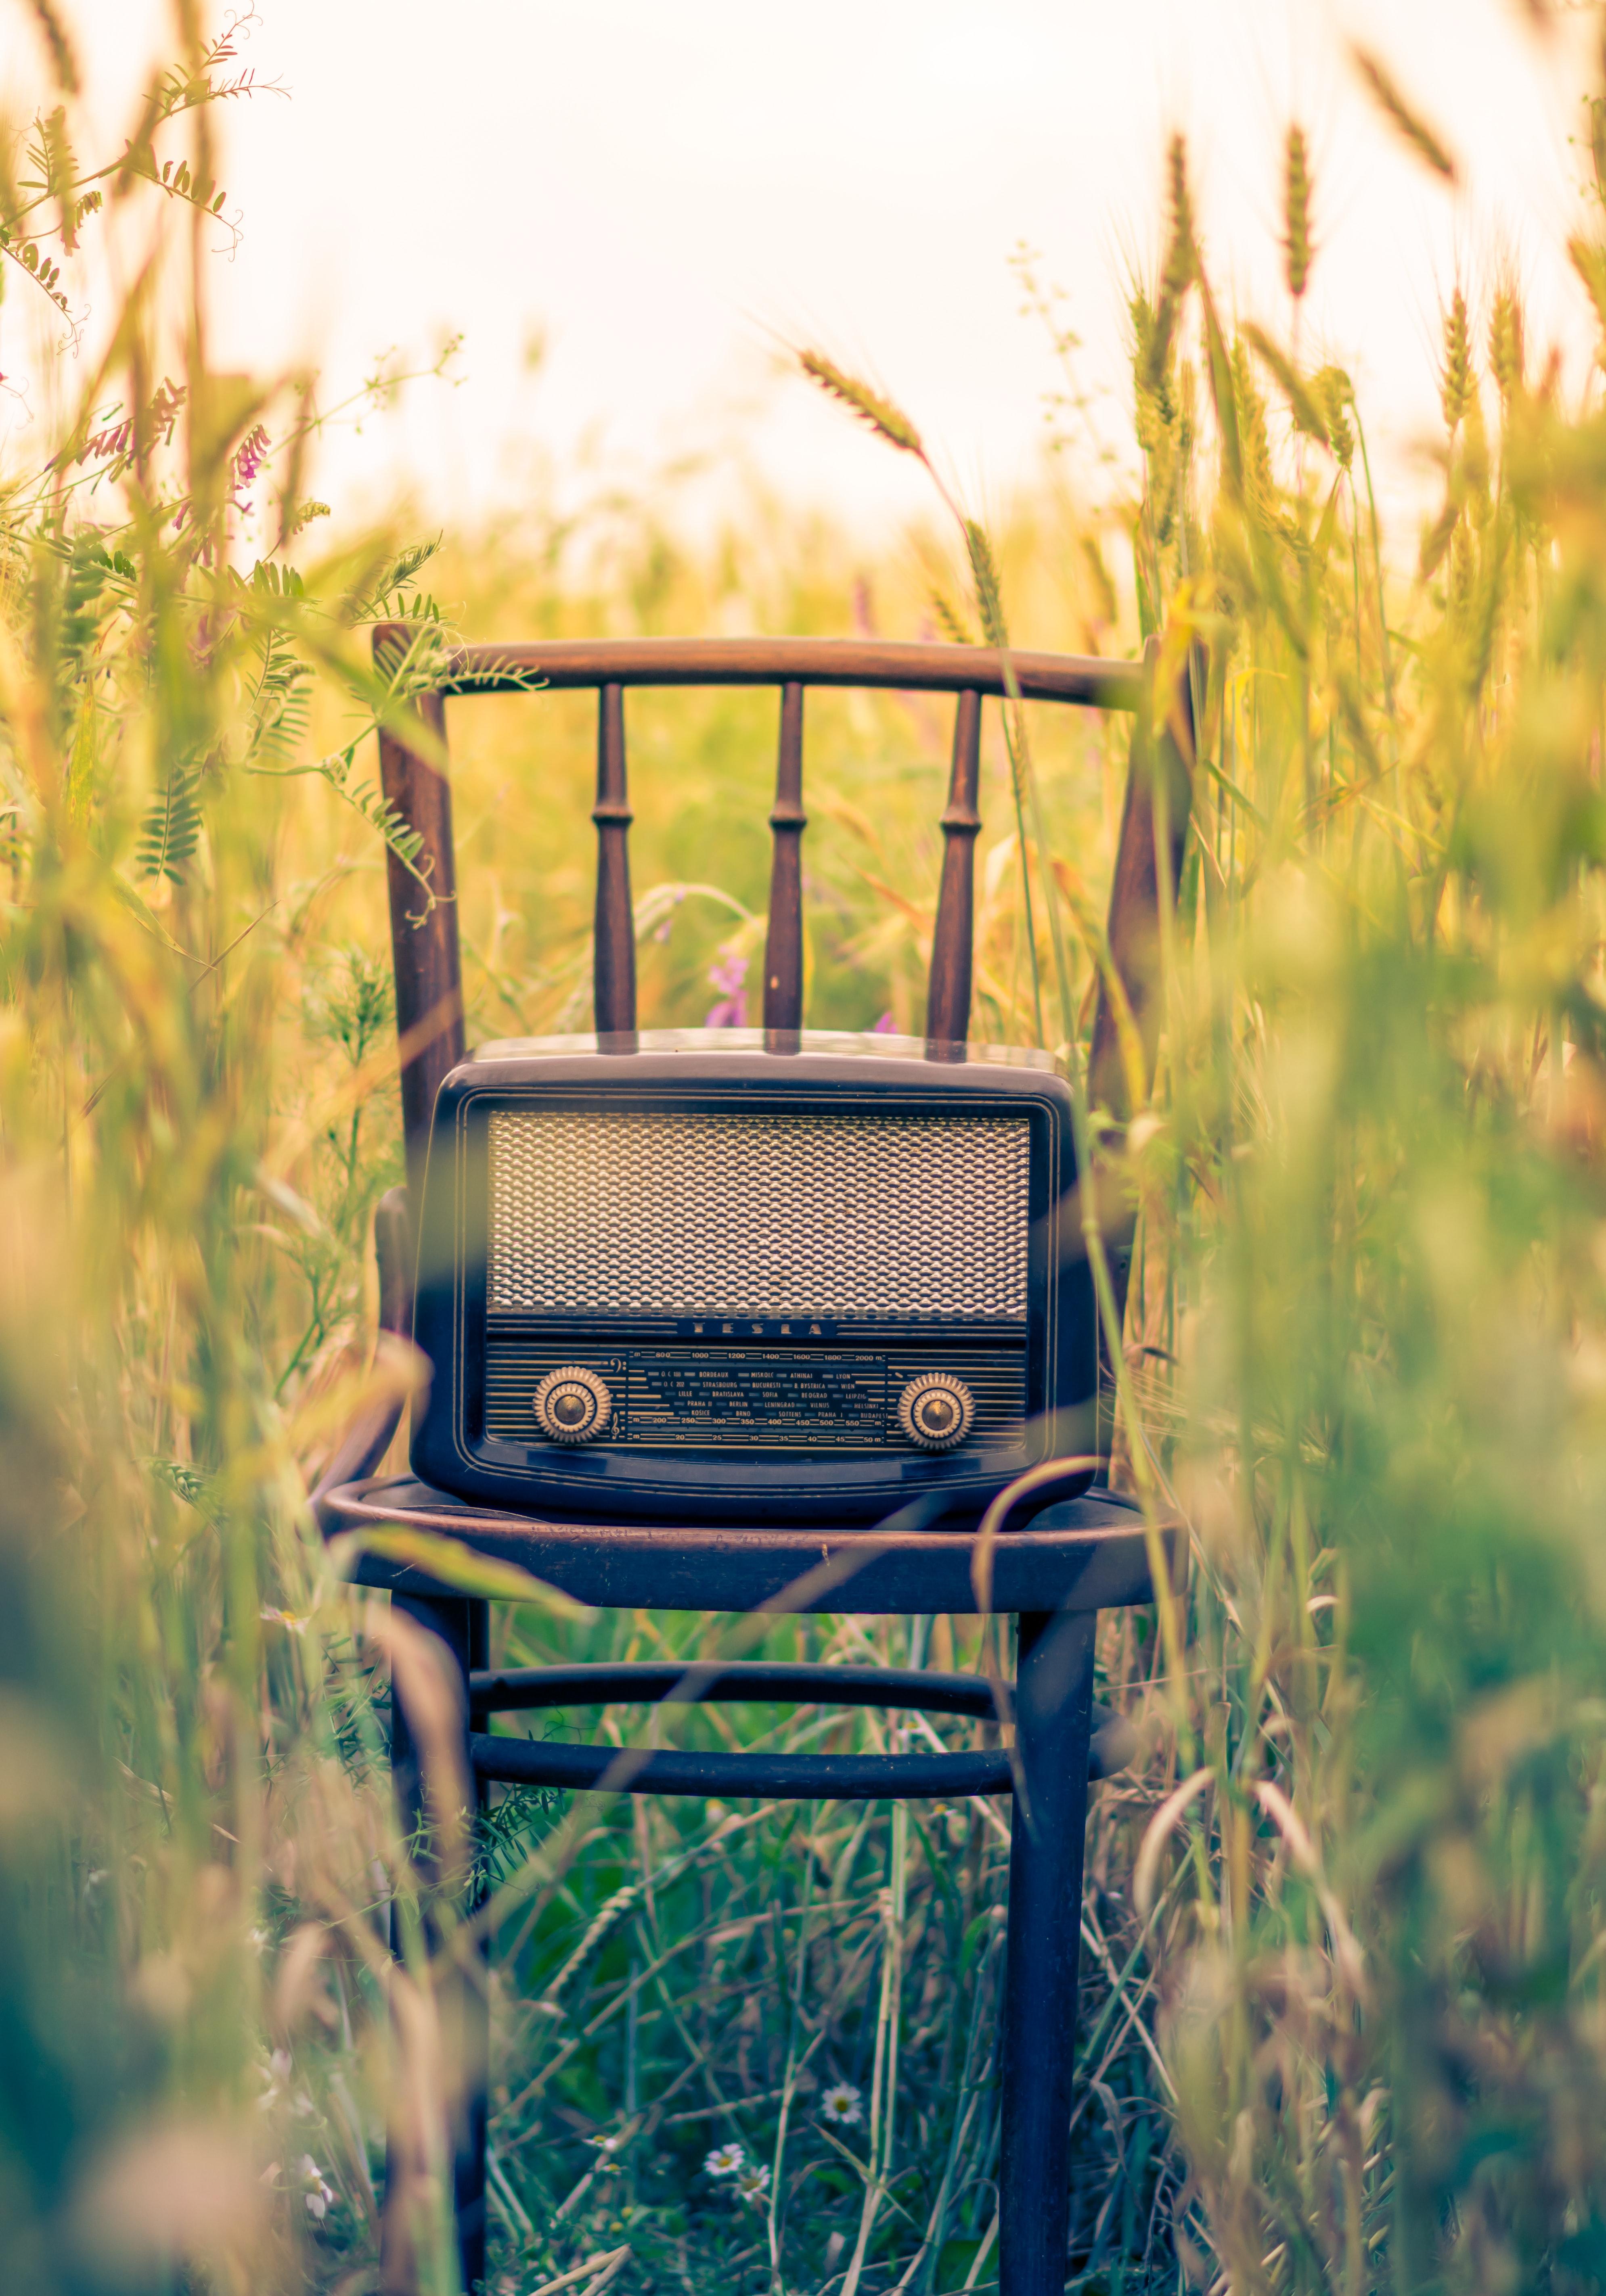 Radio services in Rakvere